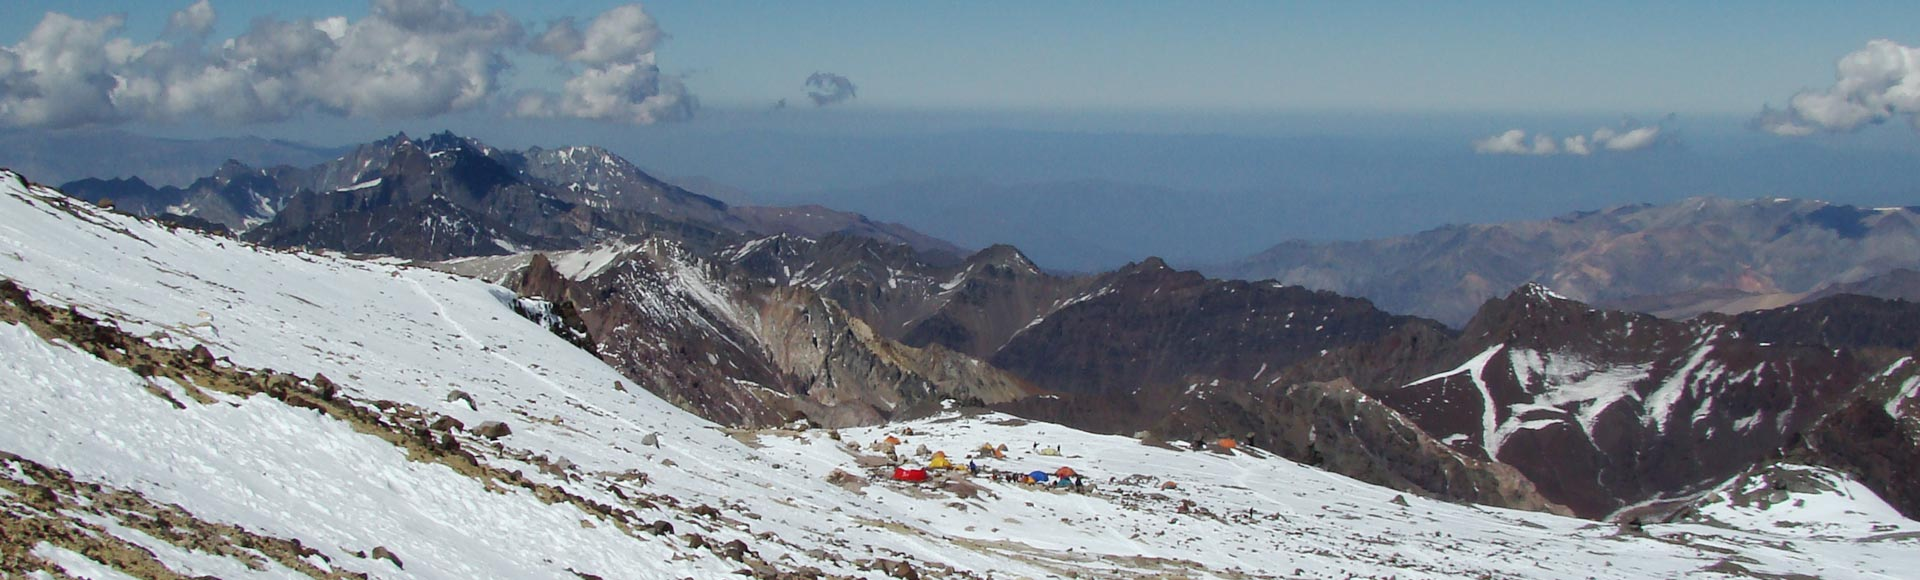 O topo do Aconcagua é logo ali!